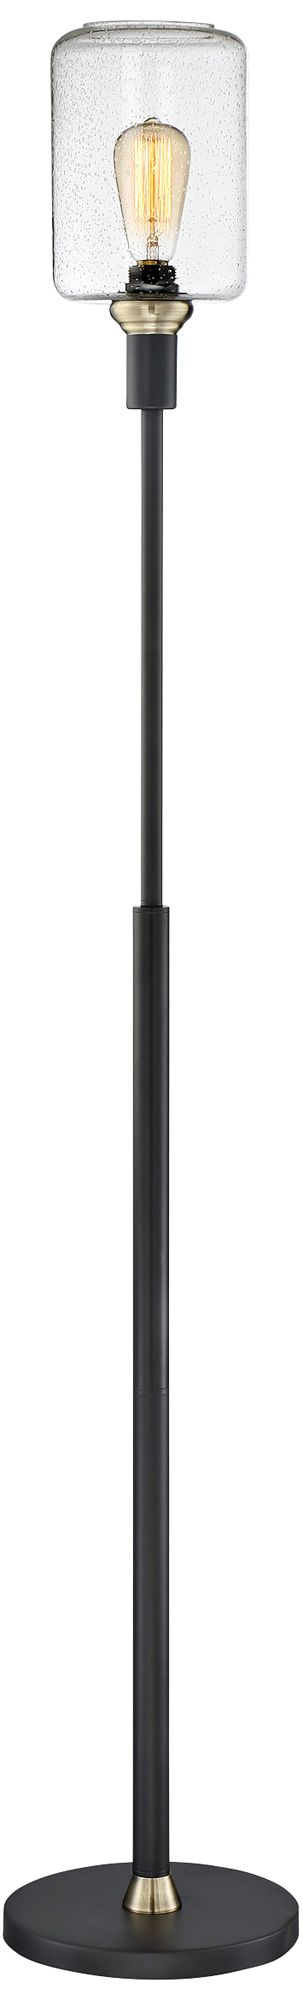 Lite Source Luken Black Uplight Floor Lamp